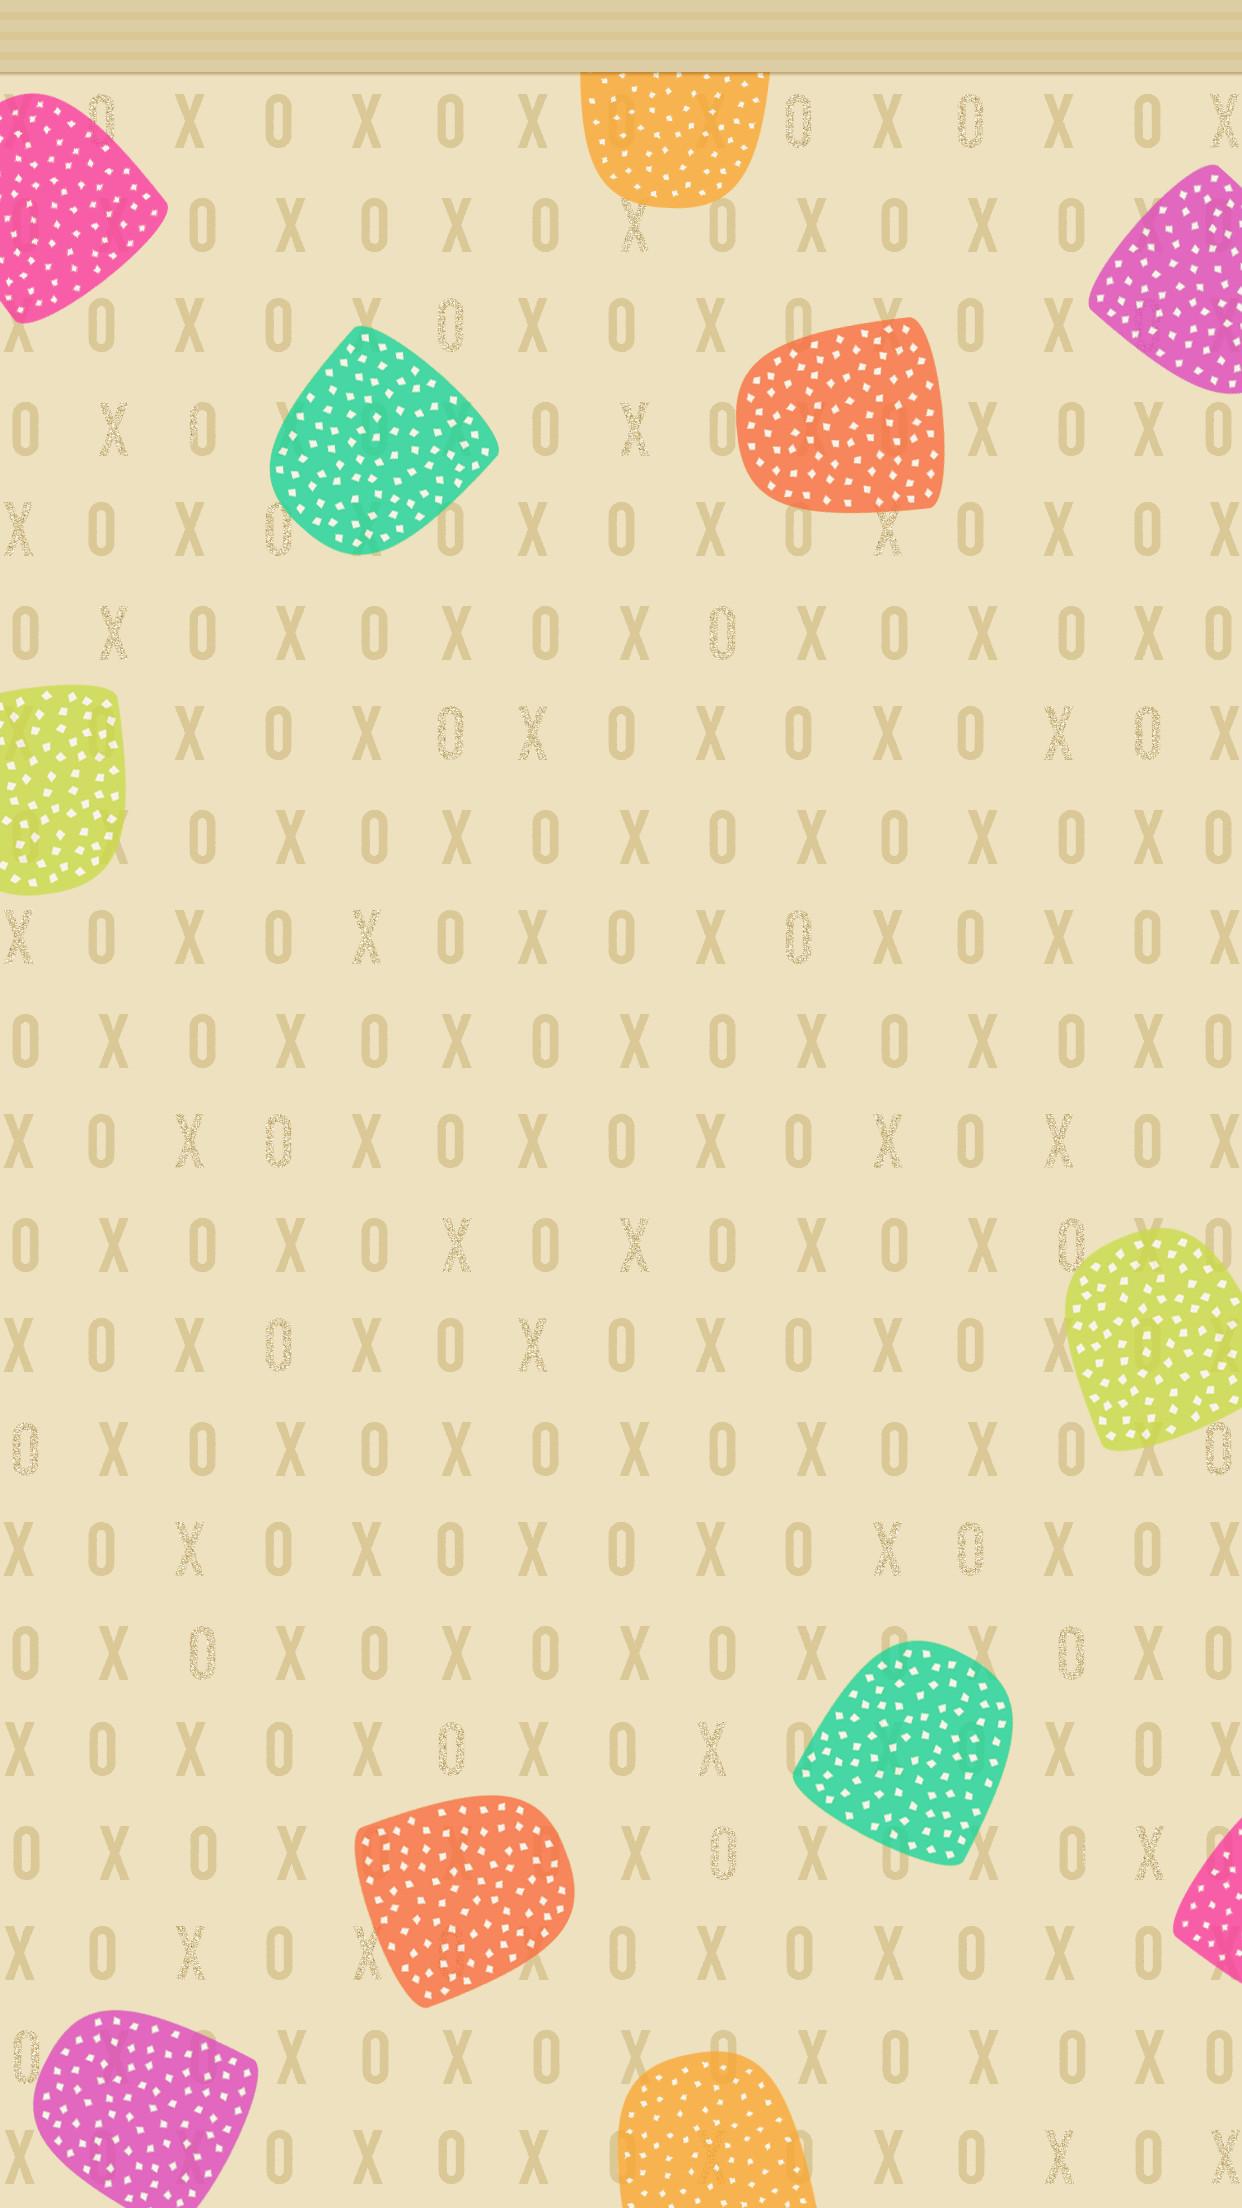 Wallpaper backgrounds · iPhone Wall tjn